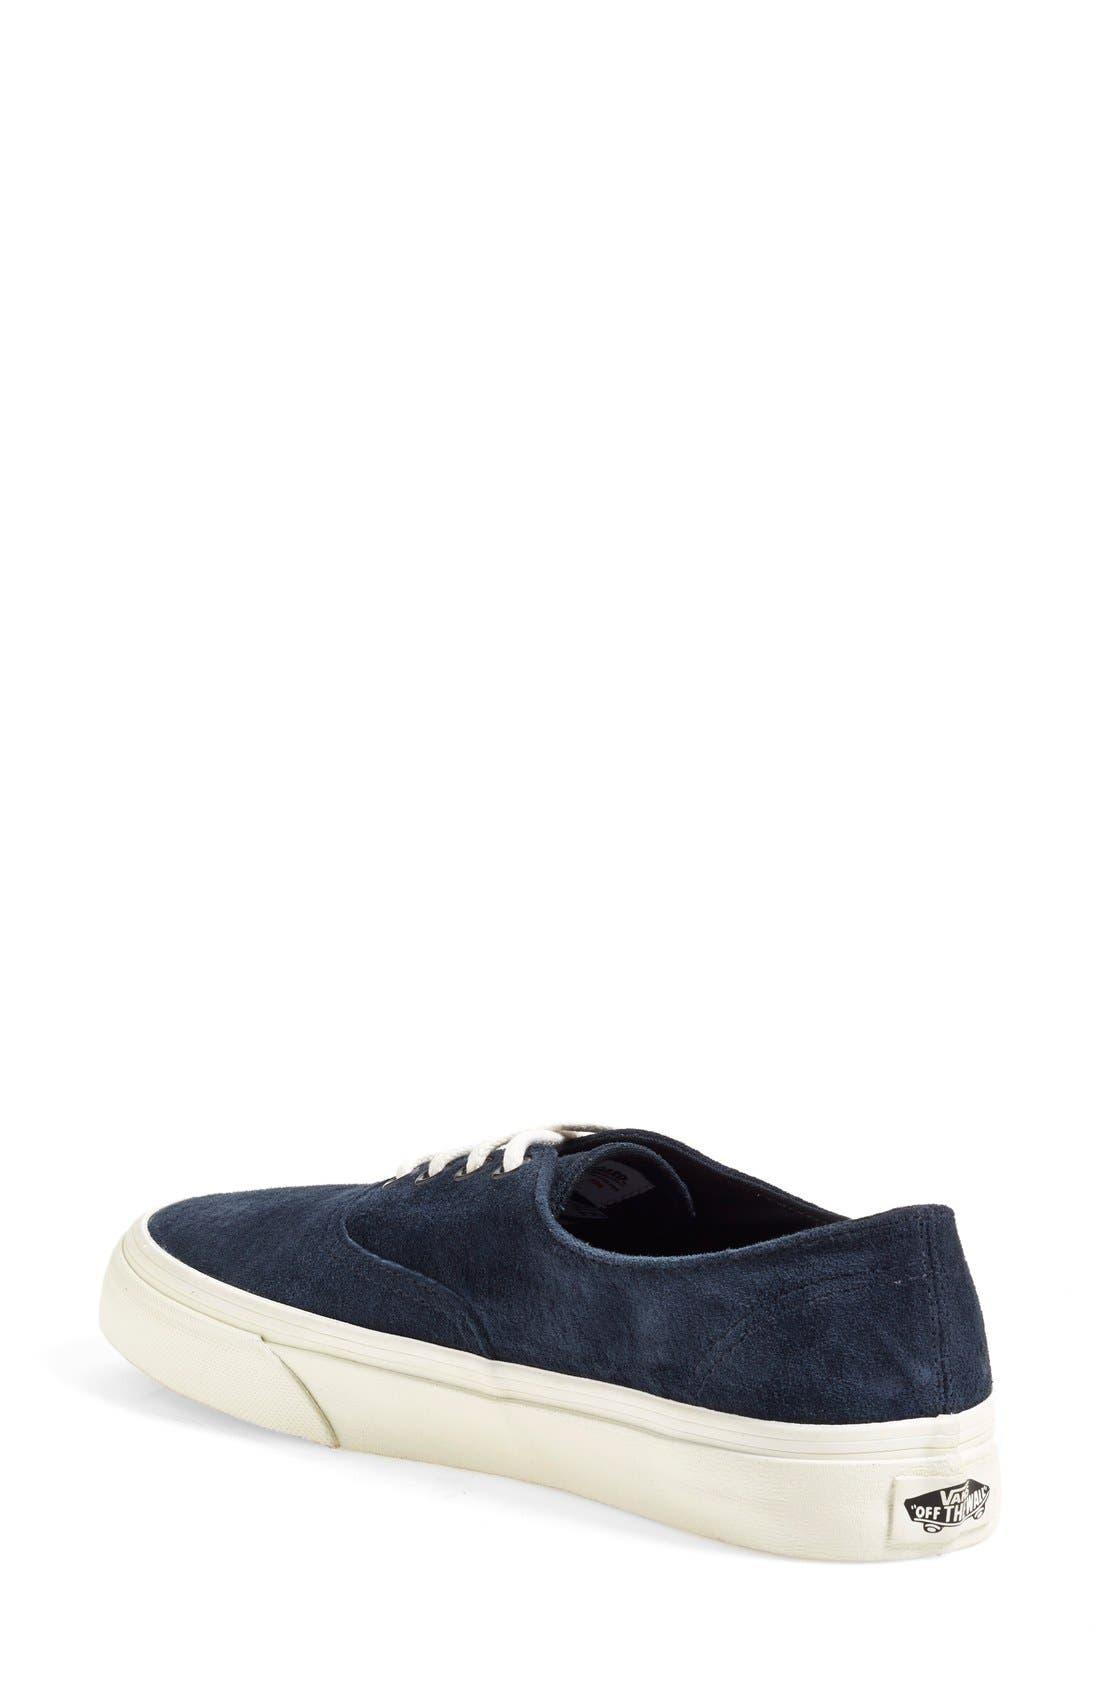 Alternate Image 2  - Vans 'Authentic - Era Decon CA' Sneaker (Women)